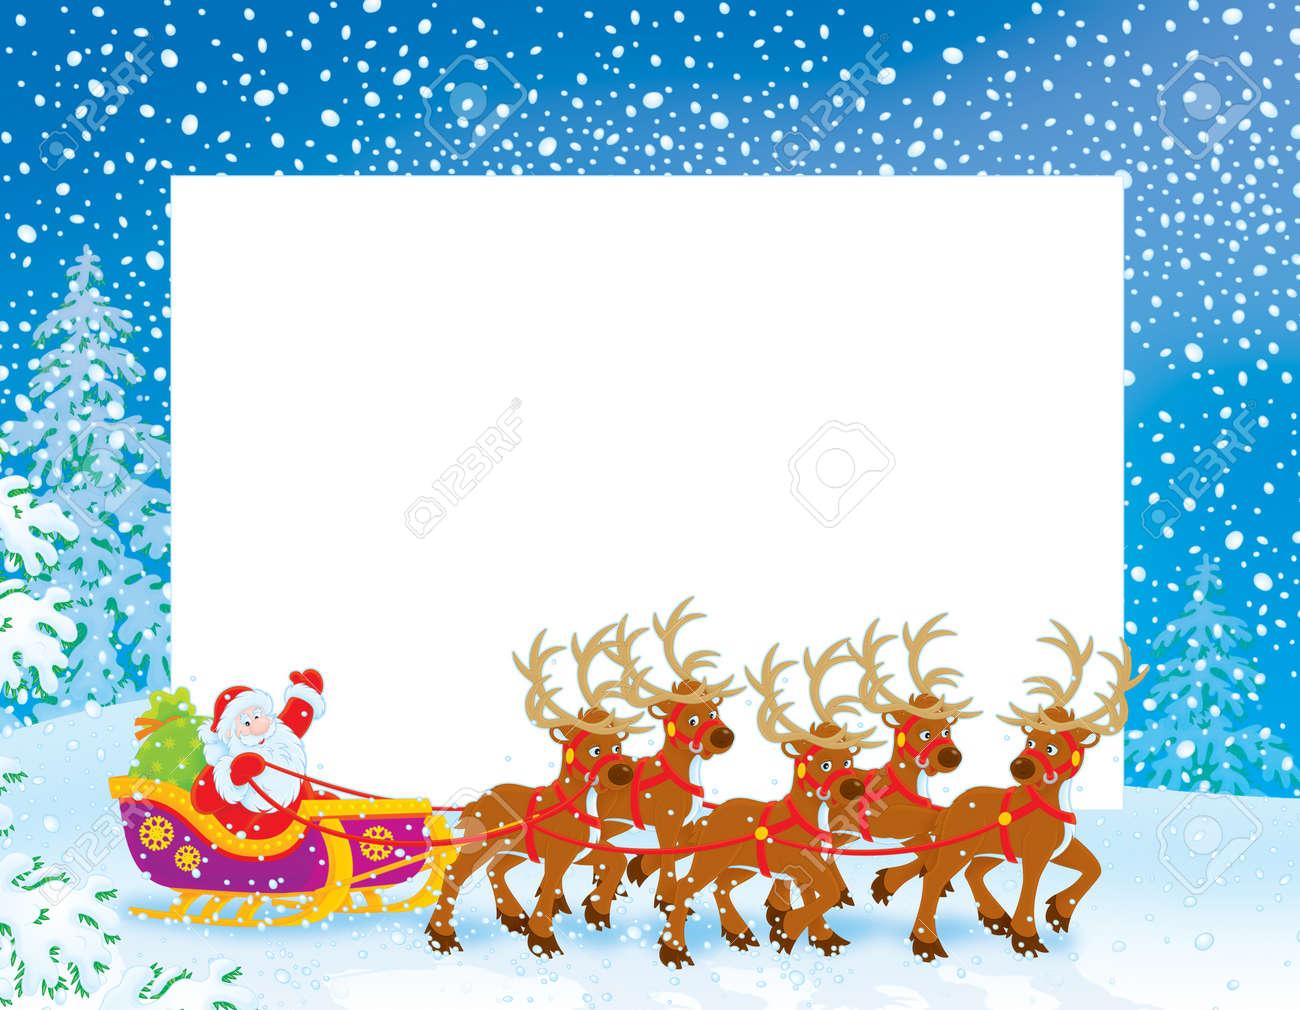 christmas santa border  Christmas Border With Sleigh Of Santa Claus Stock Photo, Picture And ...